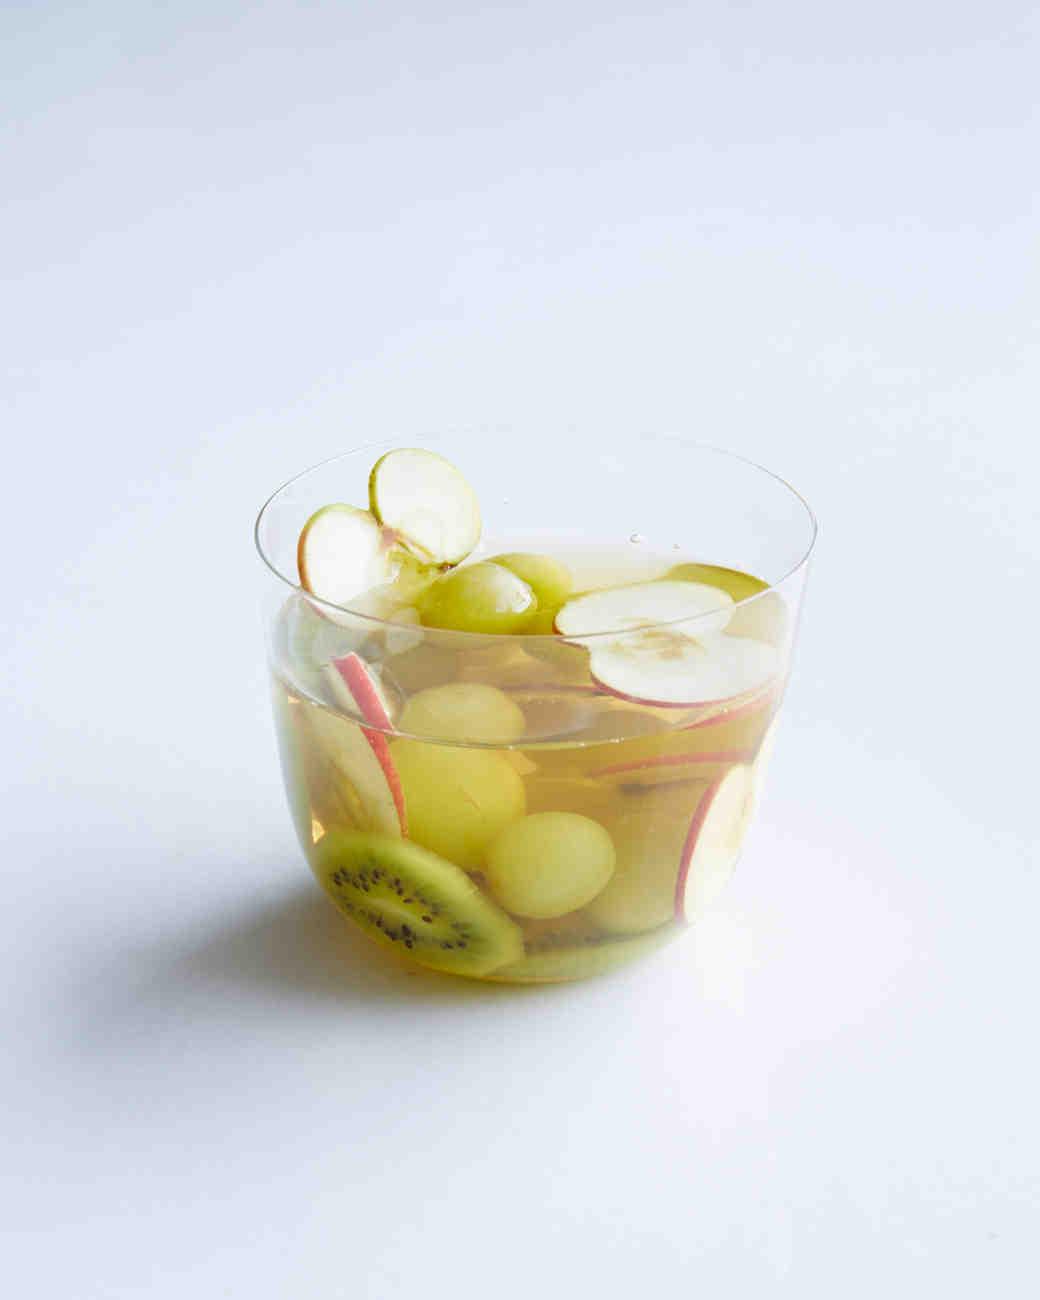 cocktail-sangria-112-d111274-0814.jpg